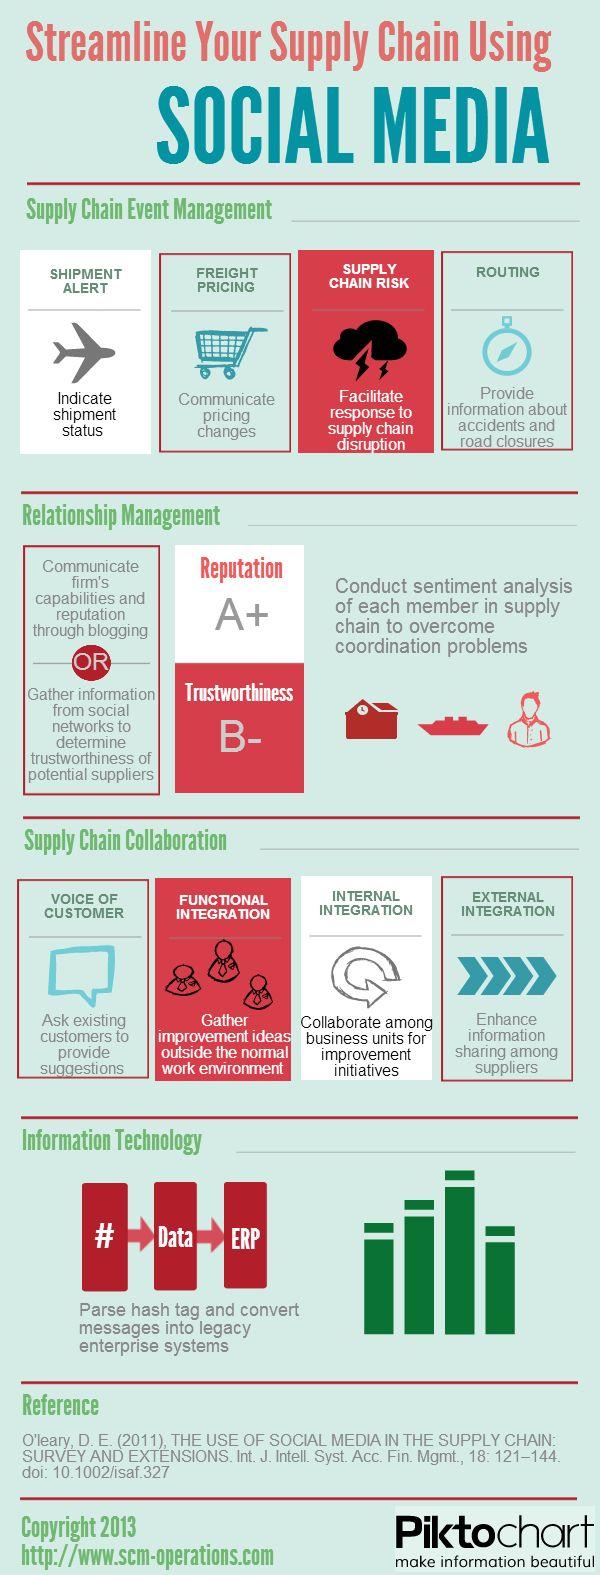 Streamline Your Supply Chain Using Social Media